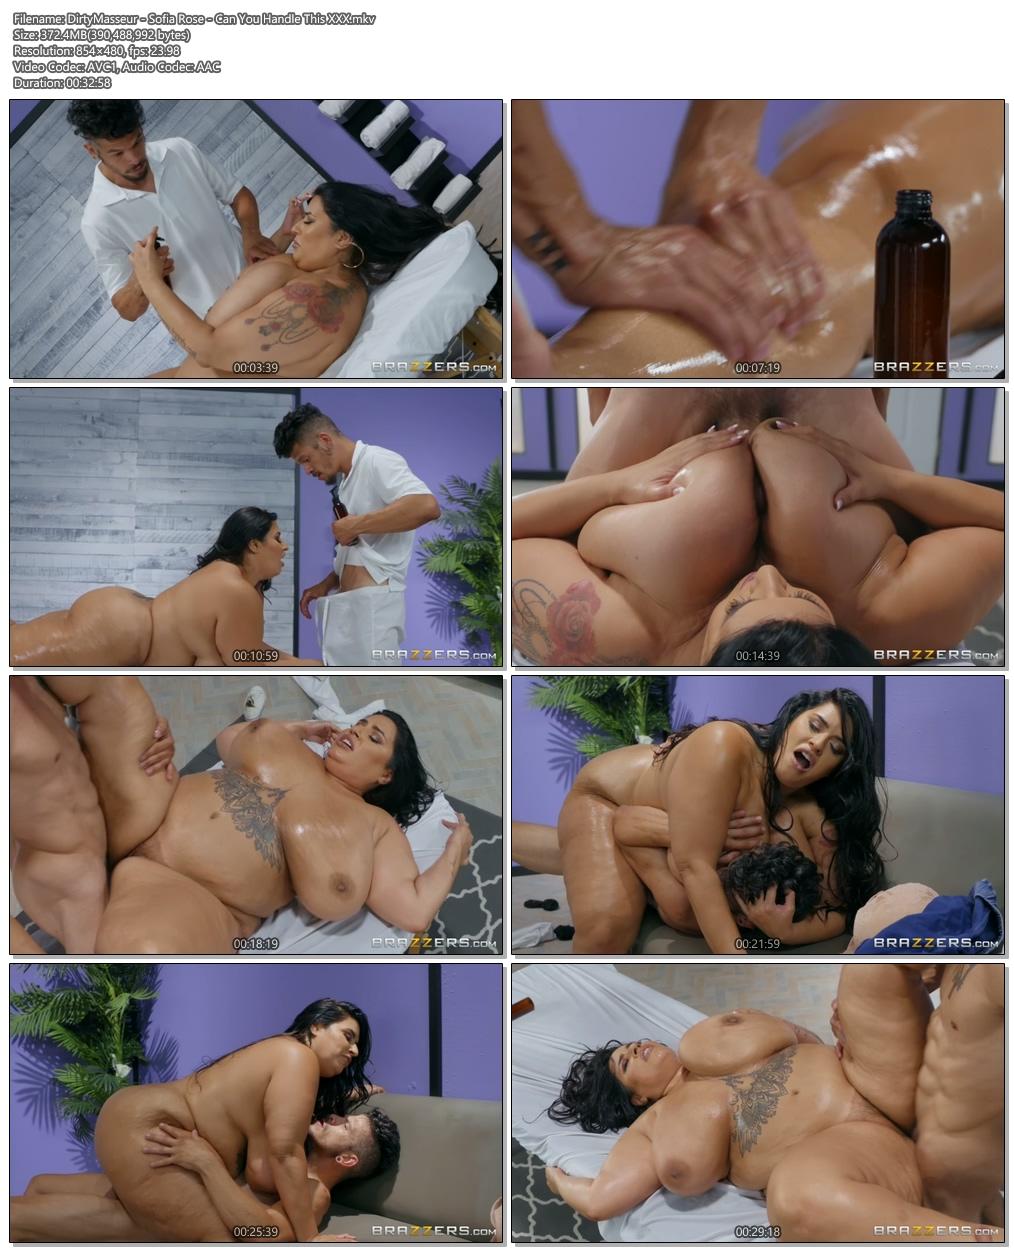 [18+] DirtyMasseur Sofia Rose Porn Video Can You Handle This XXX Screenshot